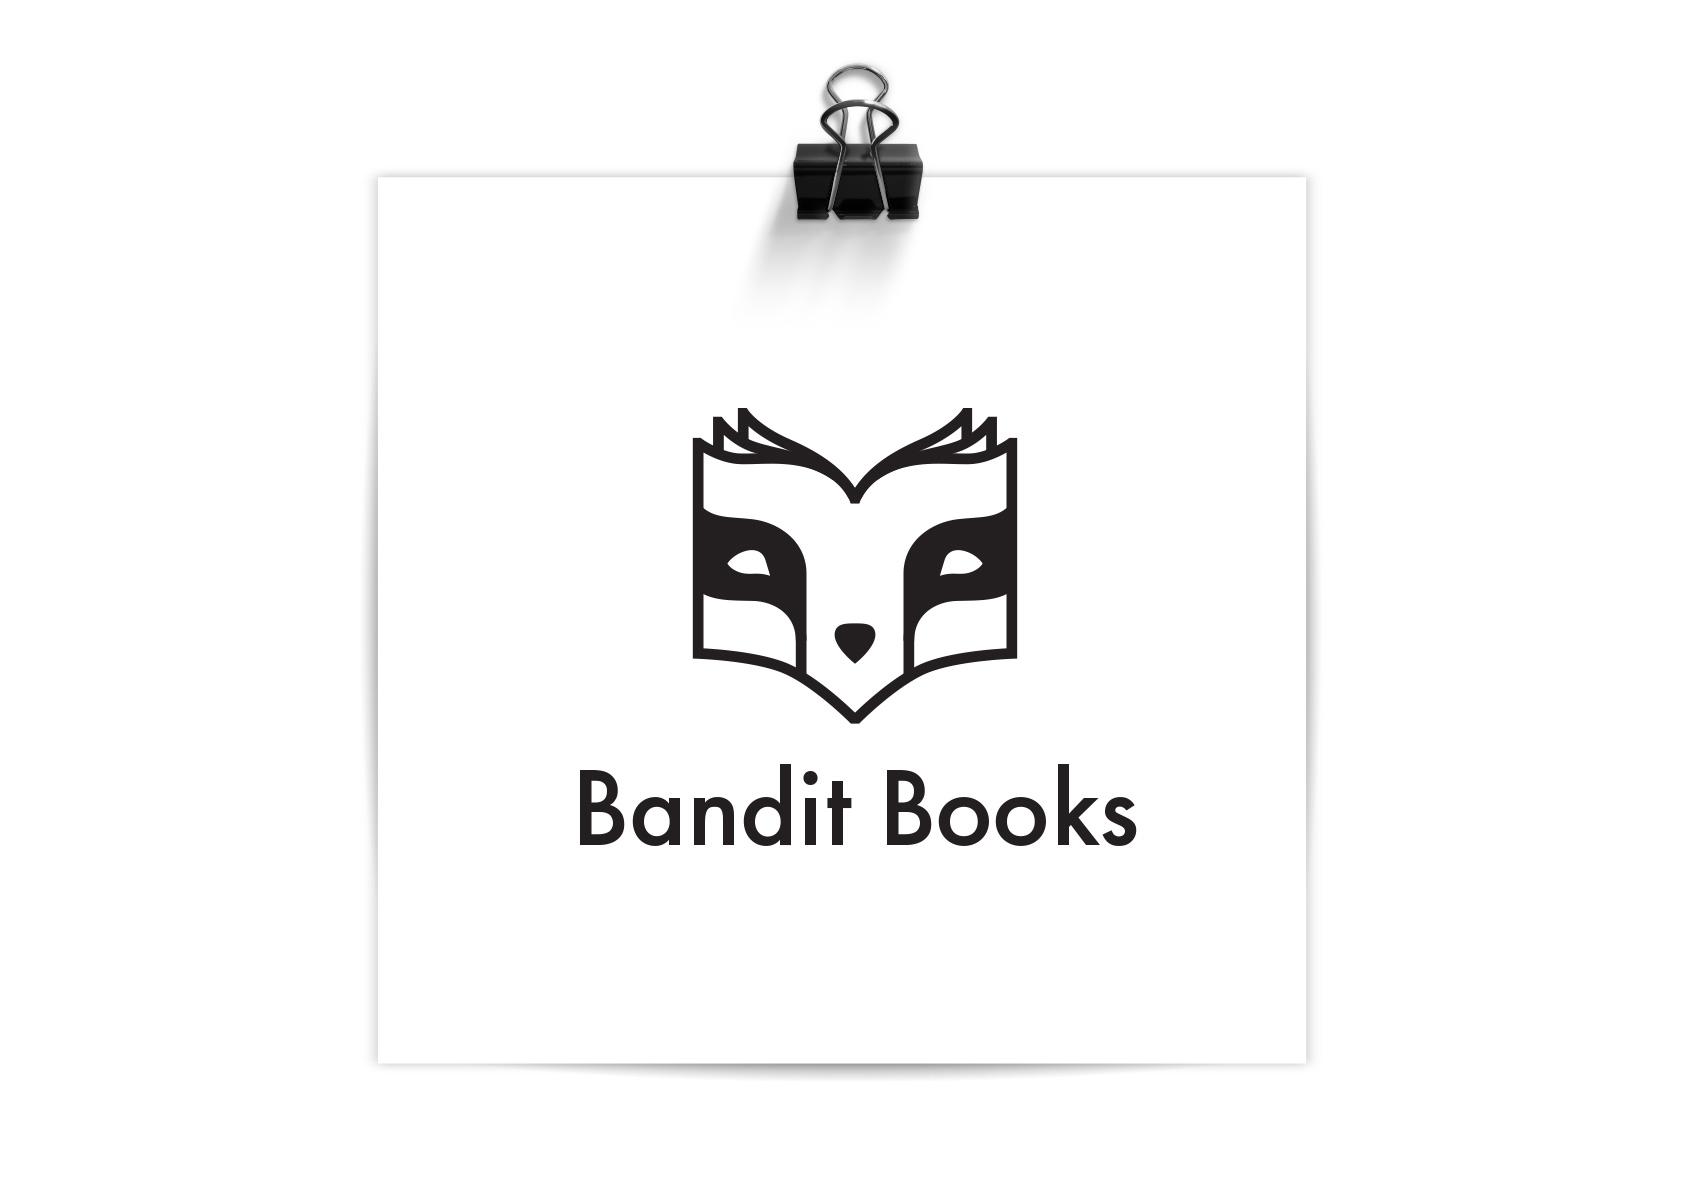 bandit-books-logo